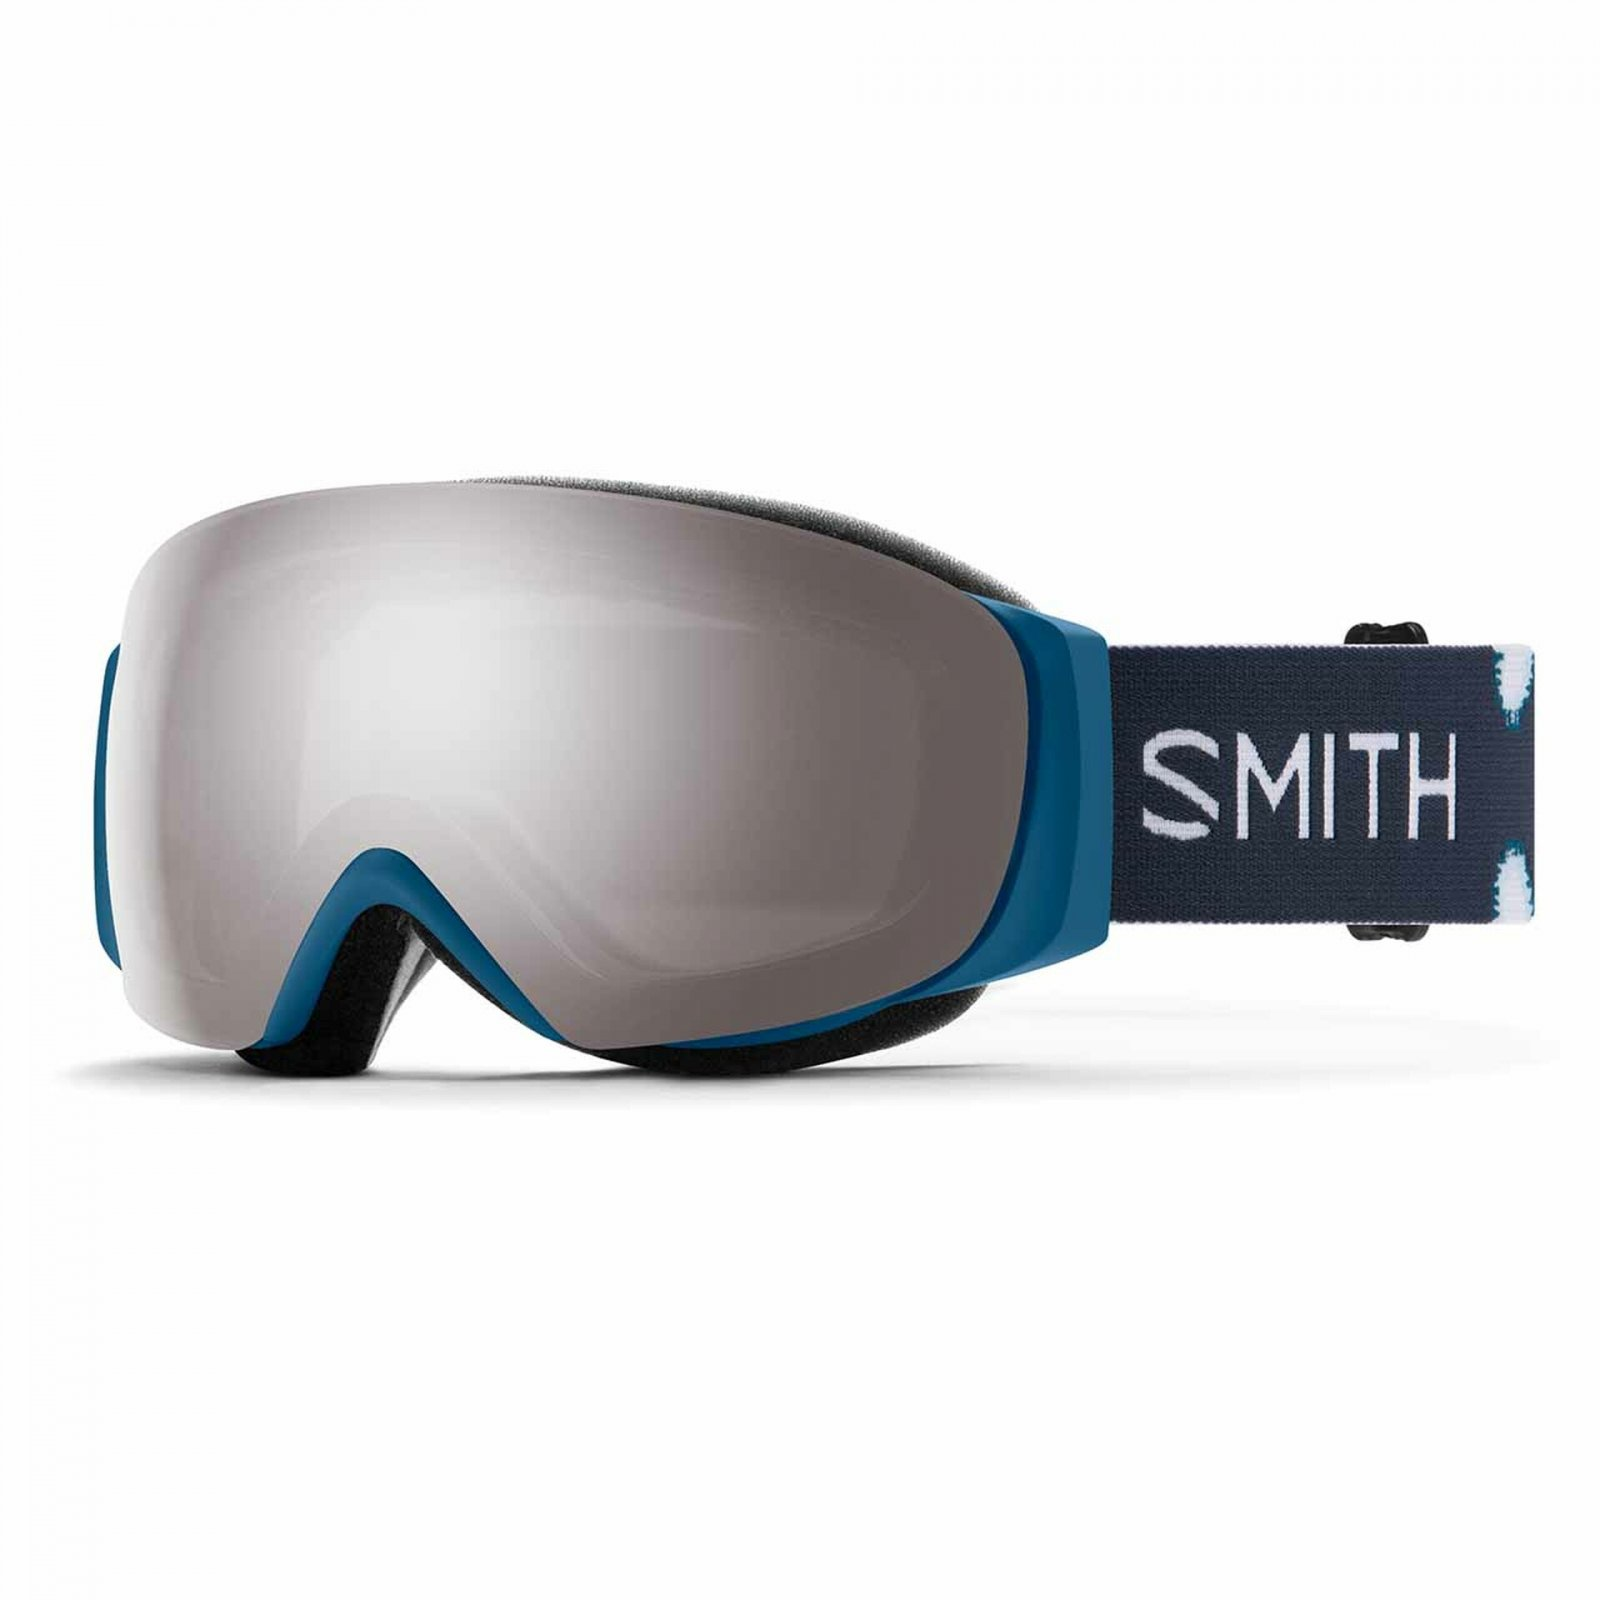 Smith I/O MAG S Snowboard Goggle (Multiple Color Options)